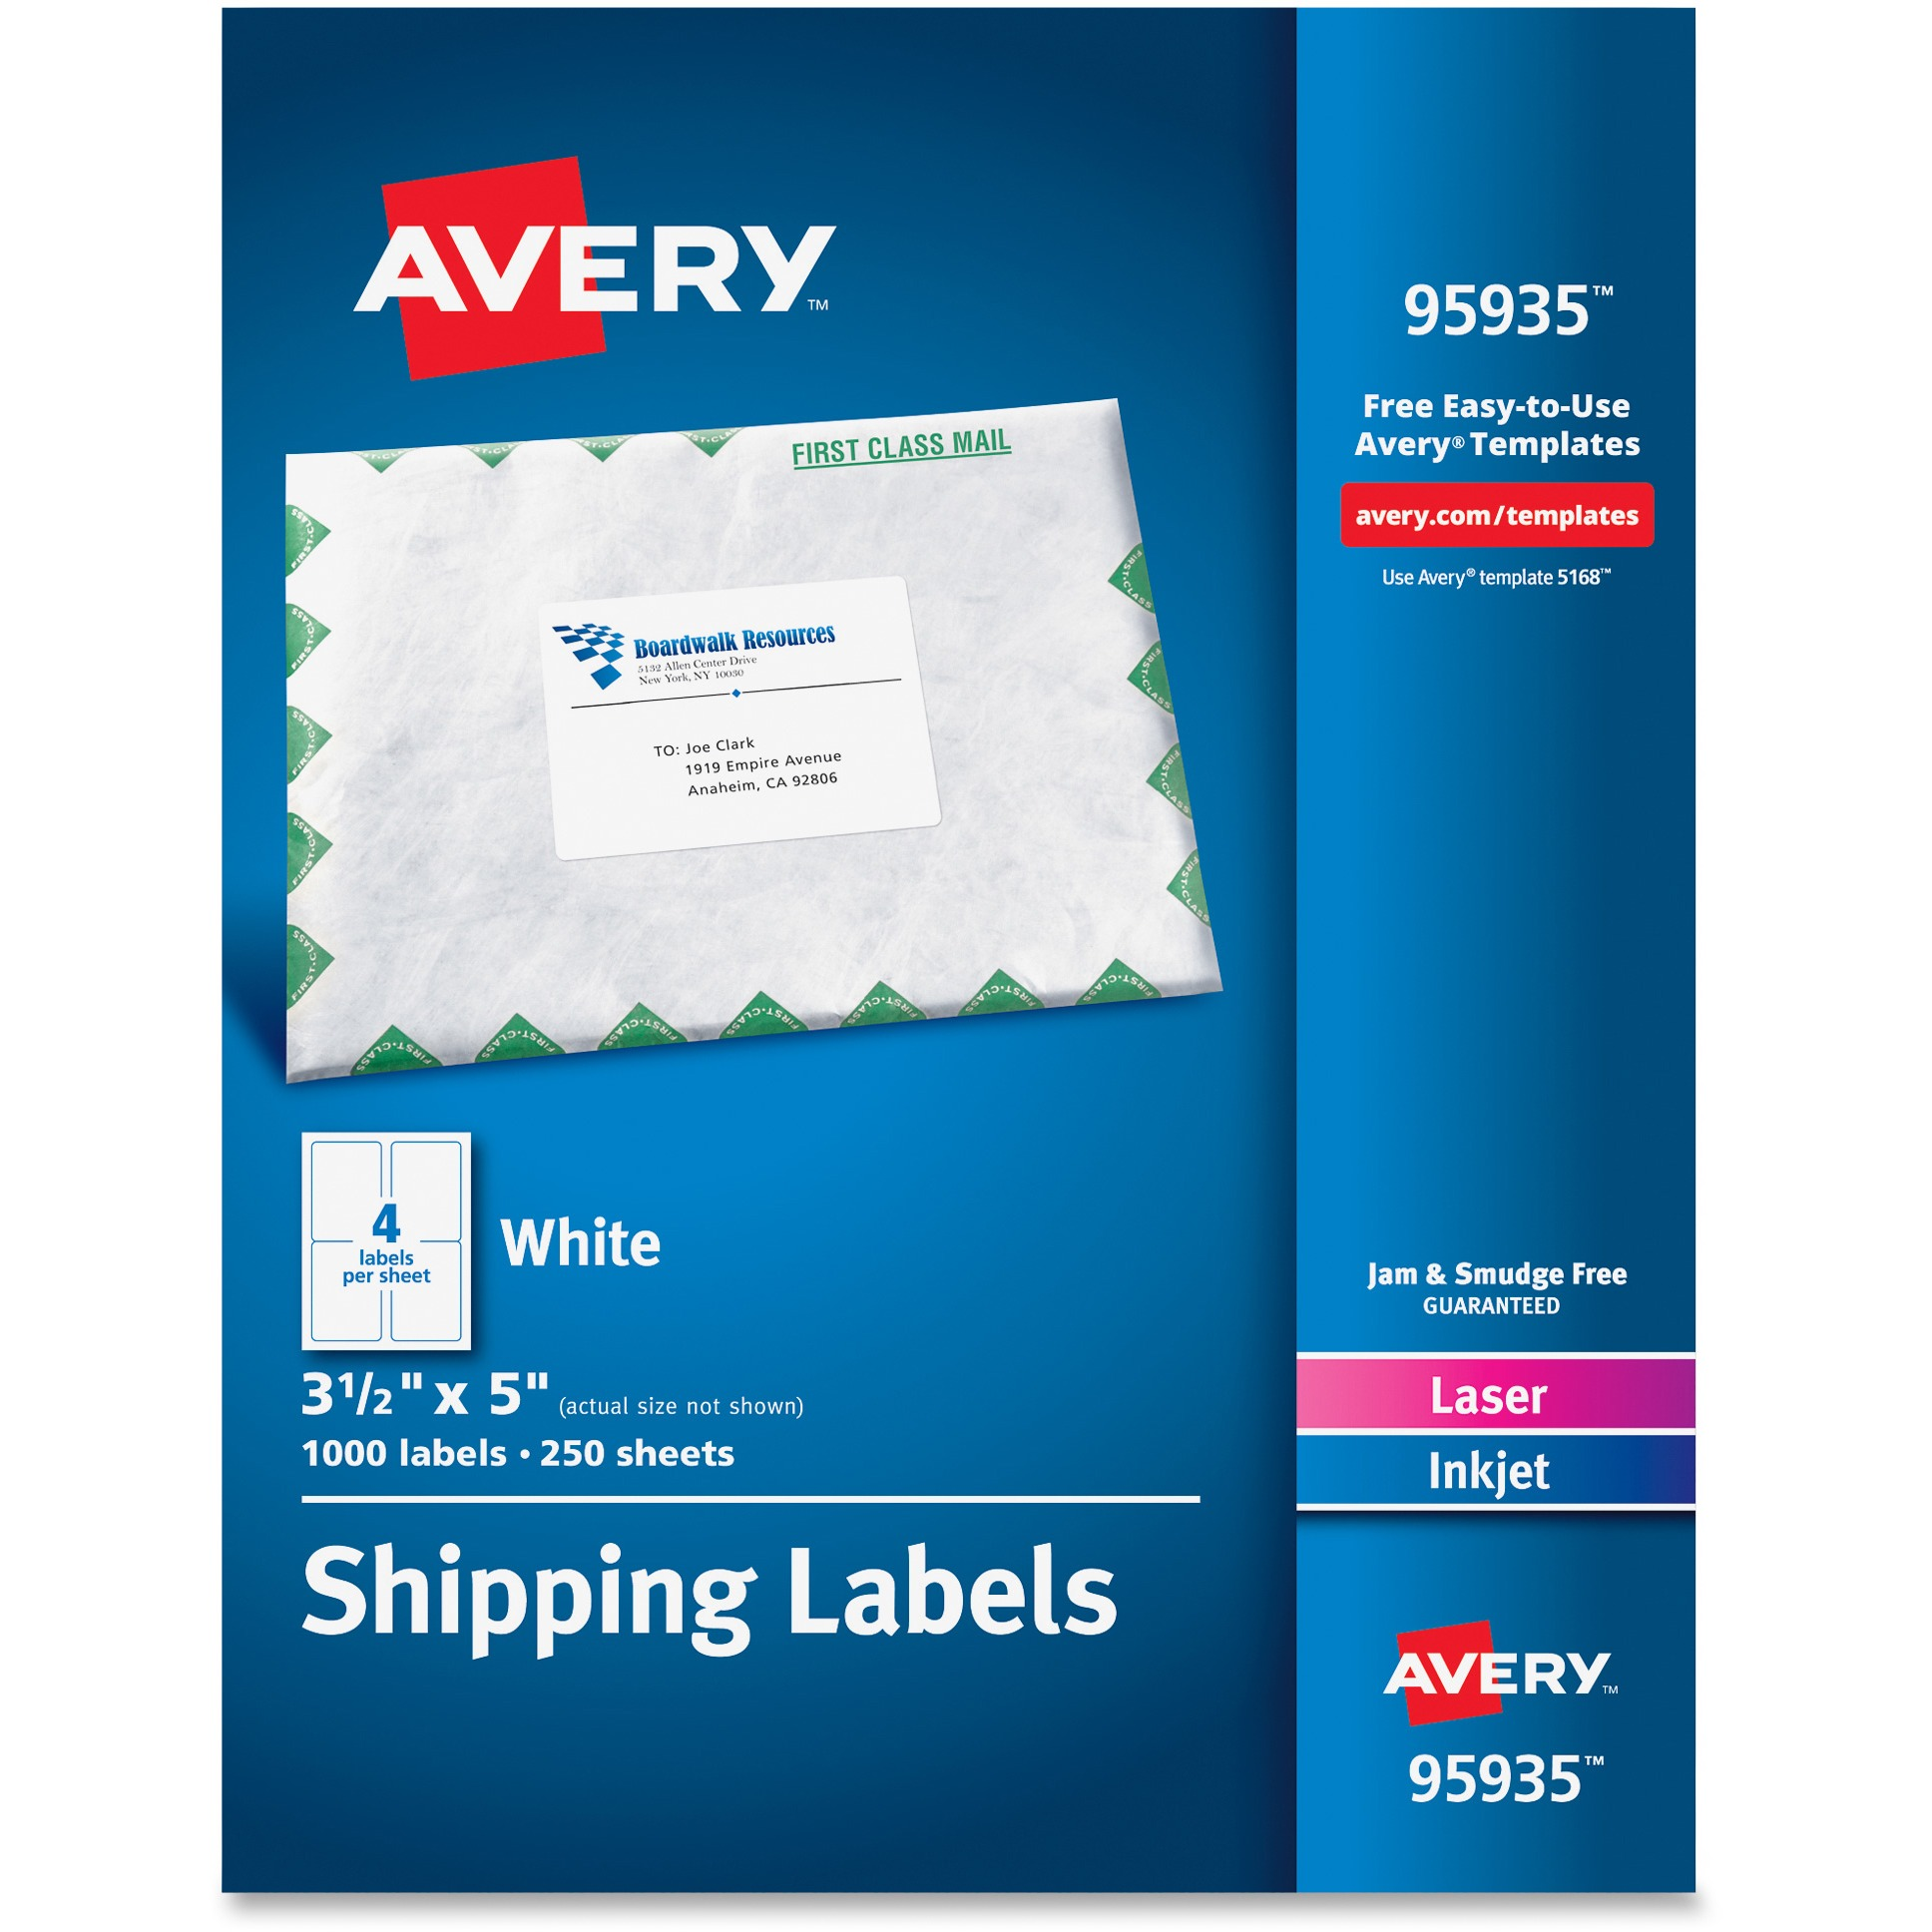 Avery White Shipping Labels, Inkjet/Laser, 3 1/2 x 5, White, 1000/Box